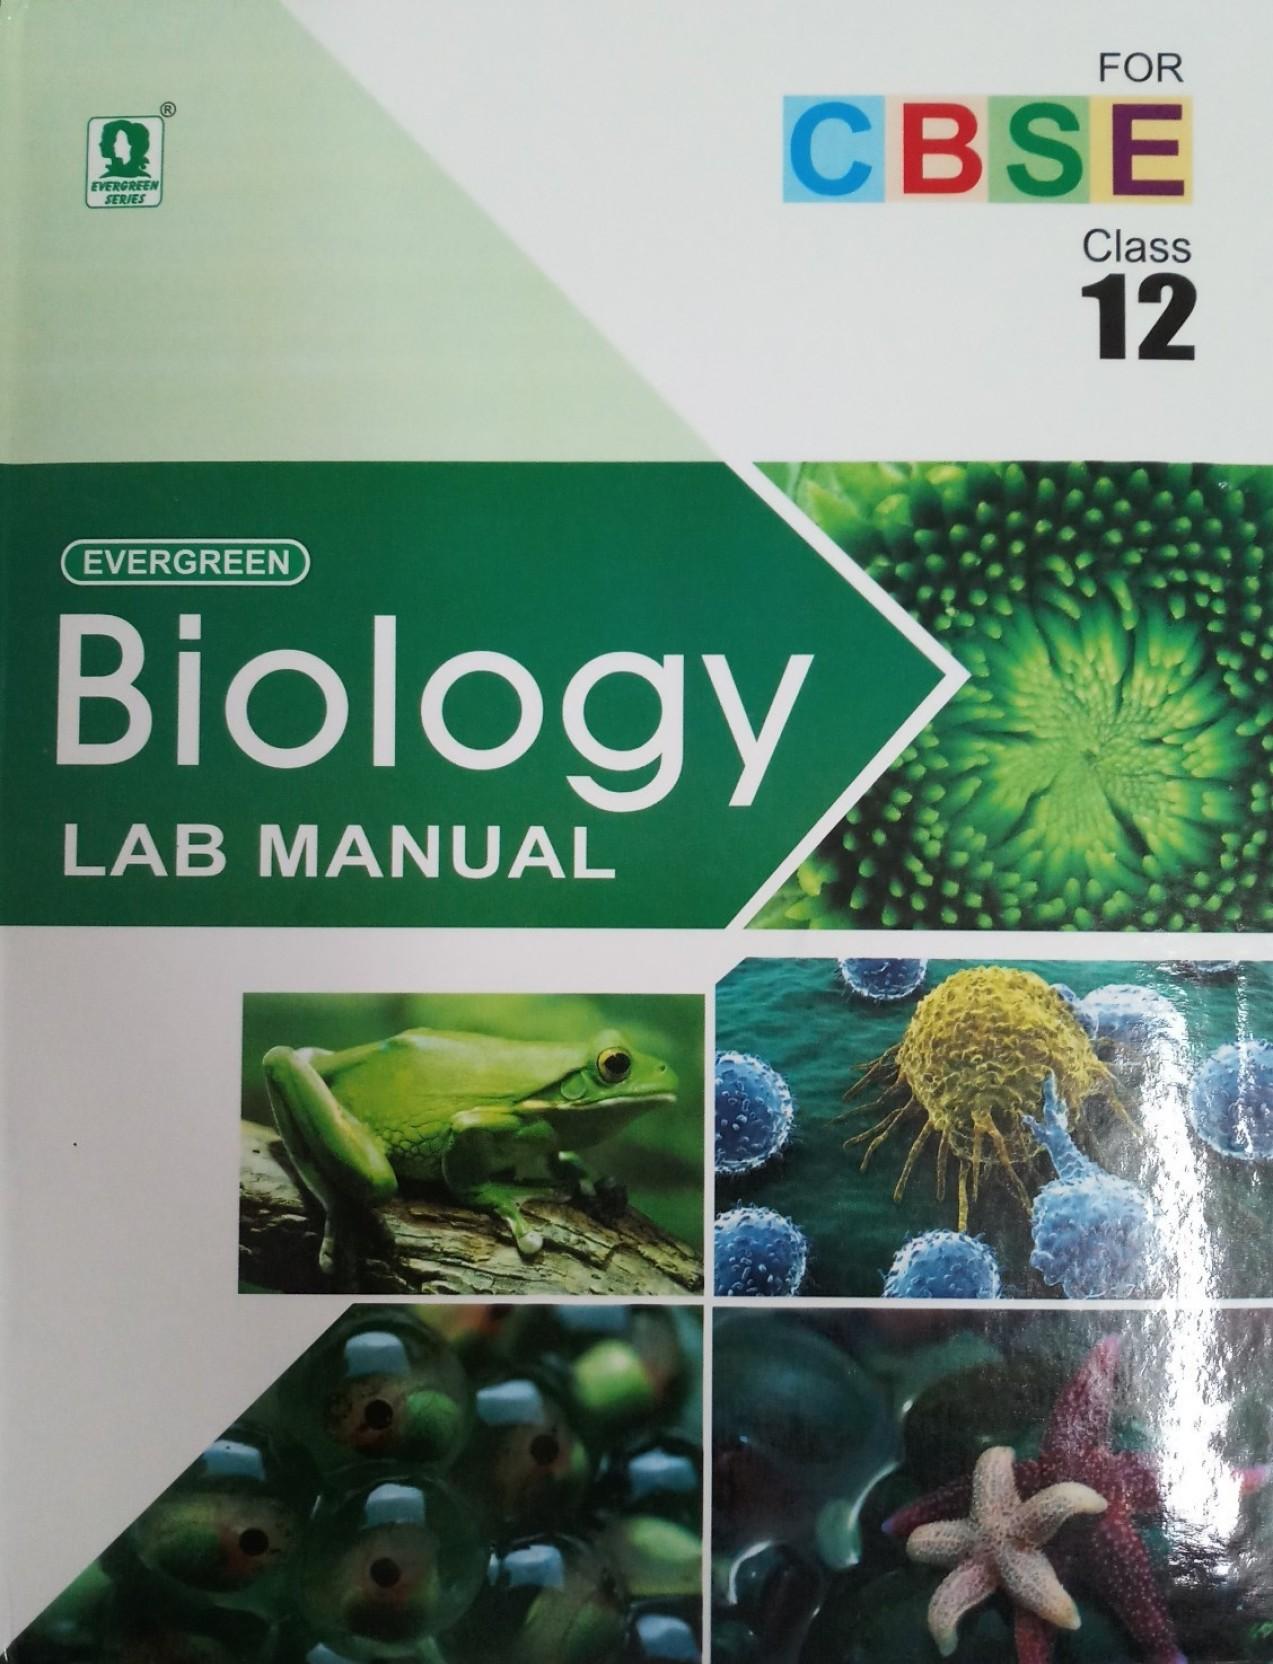 EVERGREEN BIOLOGY LAB MANUAL CLASS-12 (CBSE). ADD TO CART